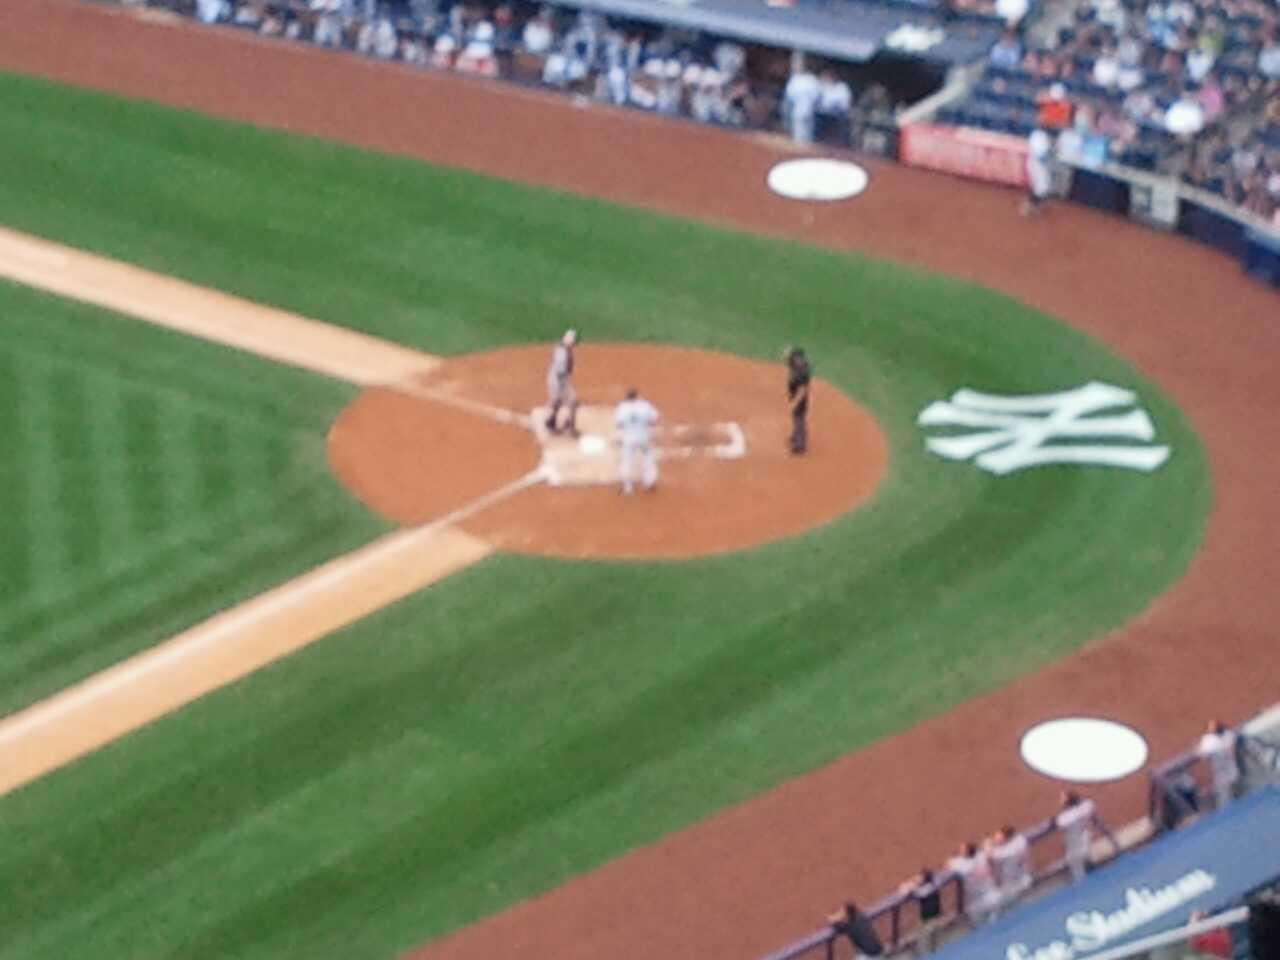 Yankee Stadium Section 428 Row 12 Seat 6